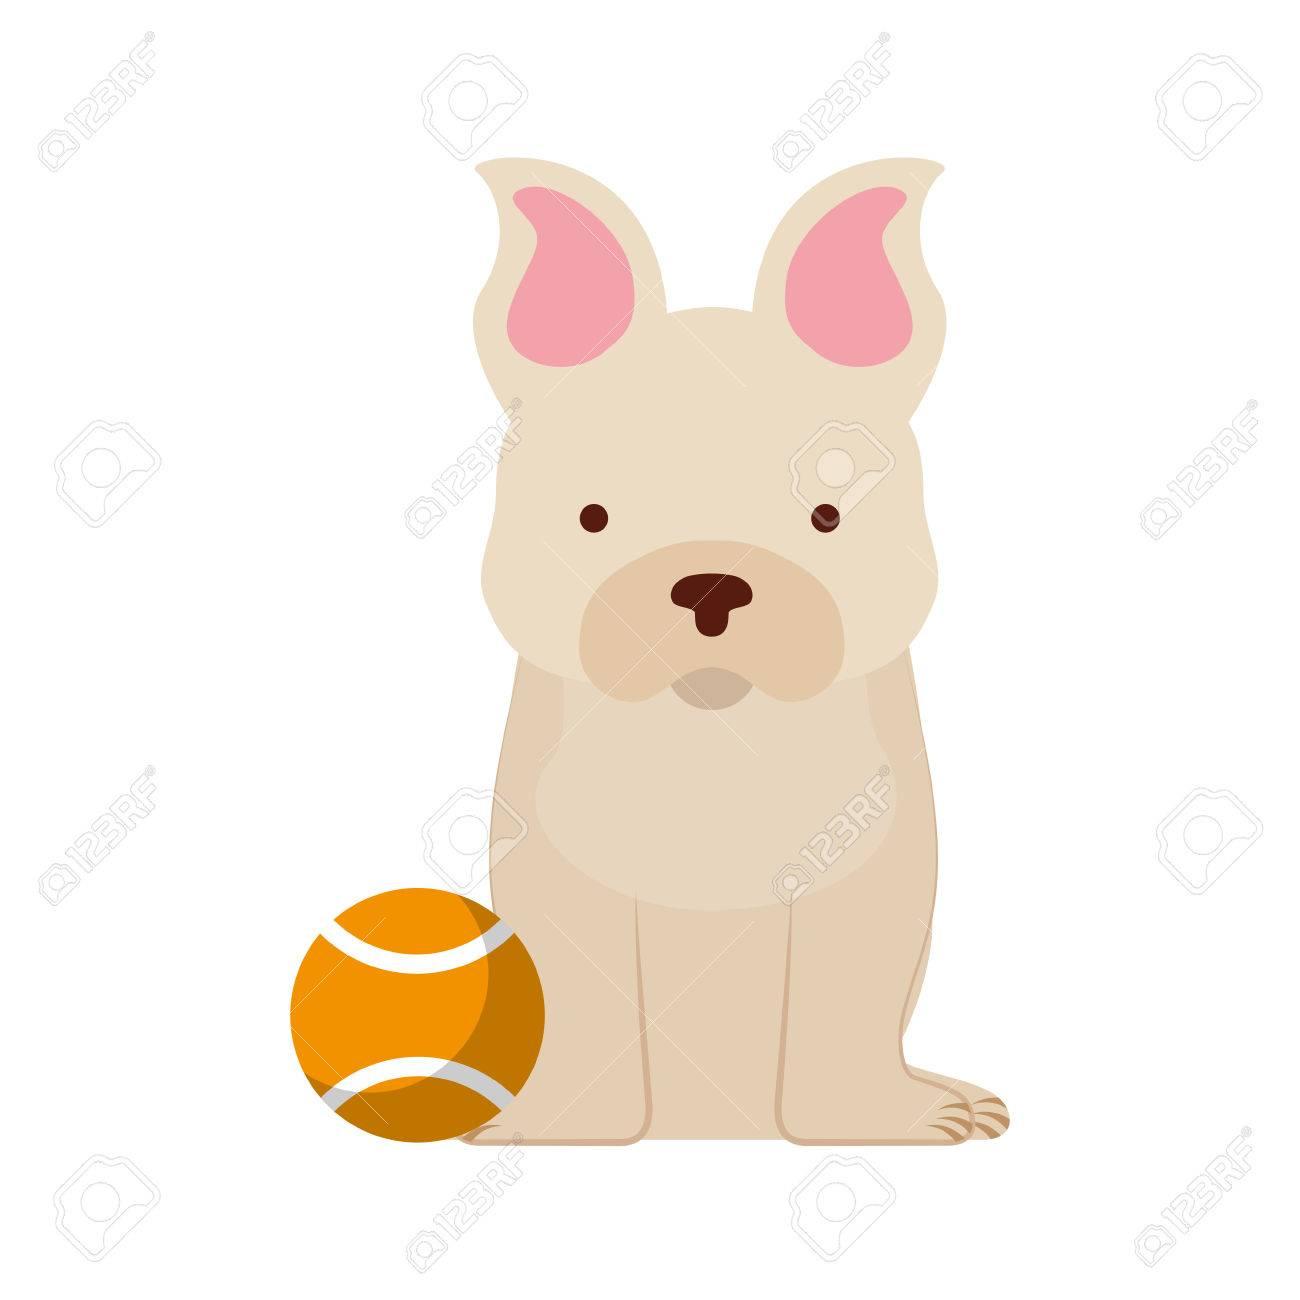 Cool Bulldog Ball Adorable Dog - 81844321-cute-dog-mascot-with-tennis-ball-vector-illustration-design  Trends_70246  .jpg